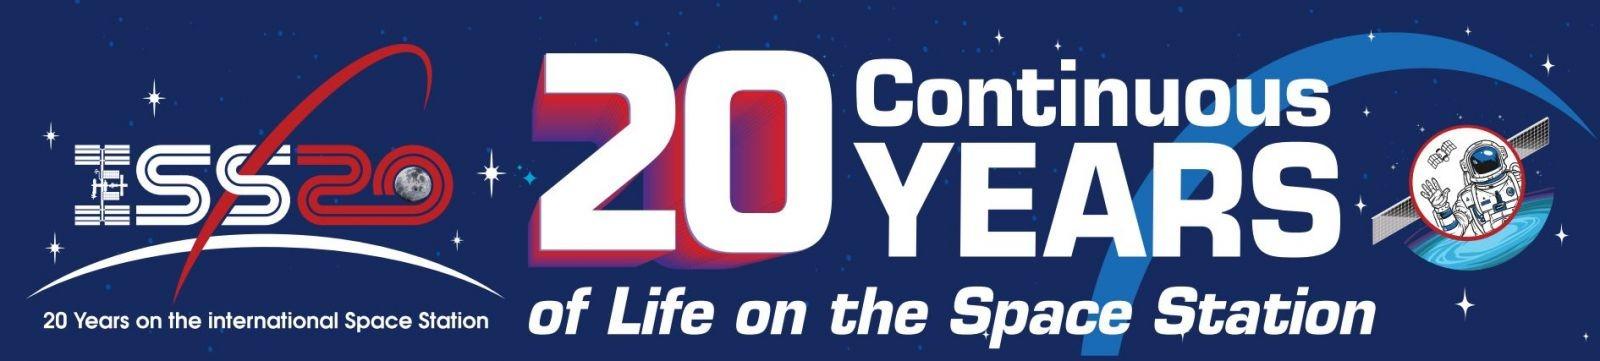 ARISS 20. YIL SSTV Etkinliği